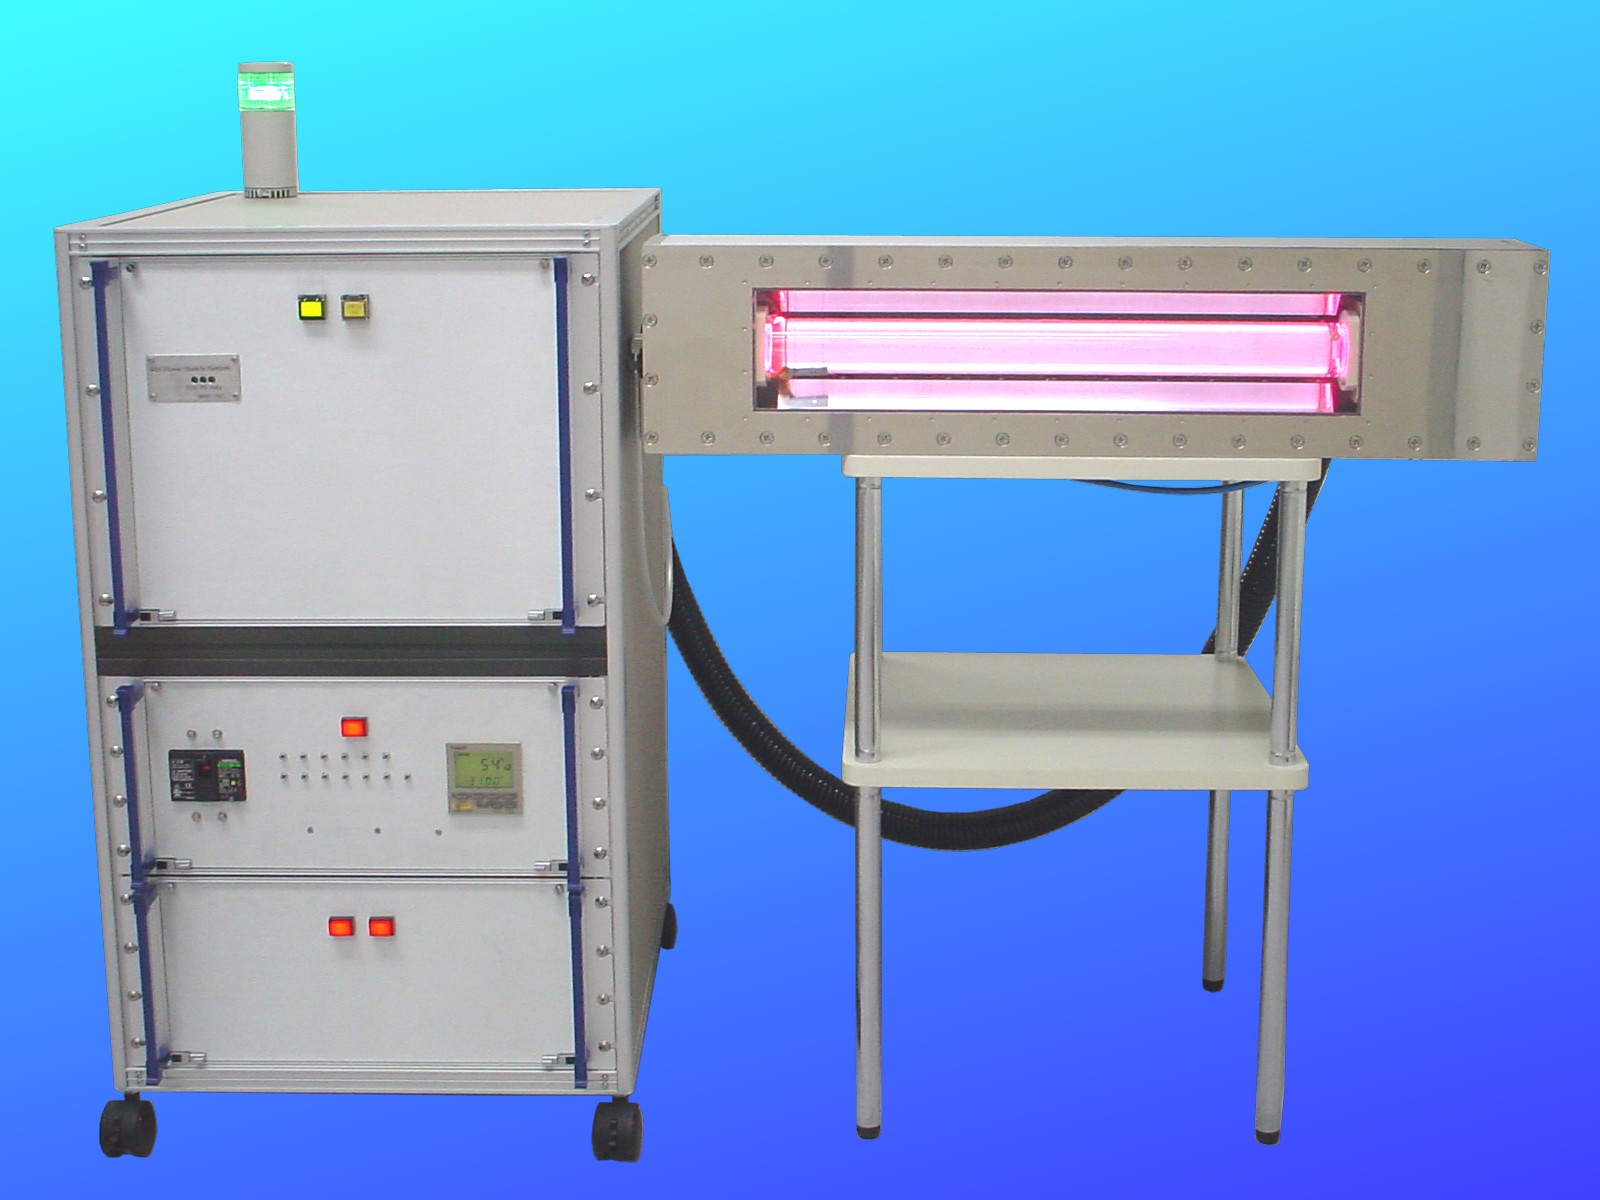 MMCテクノ - MMC Inc -エキシマランプ照射装置のエムエムシー -Execimer